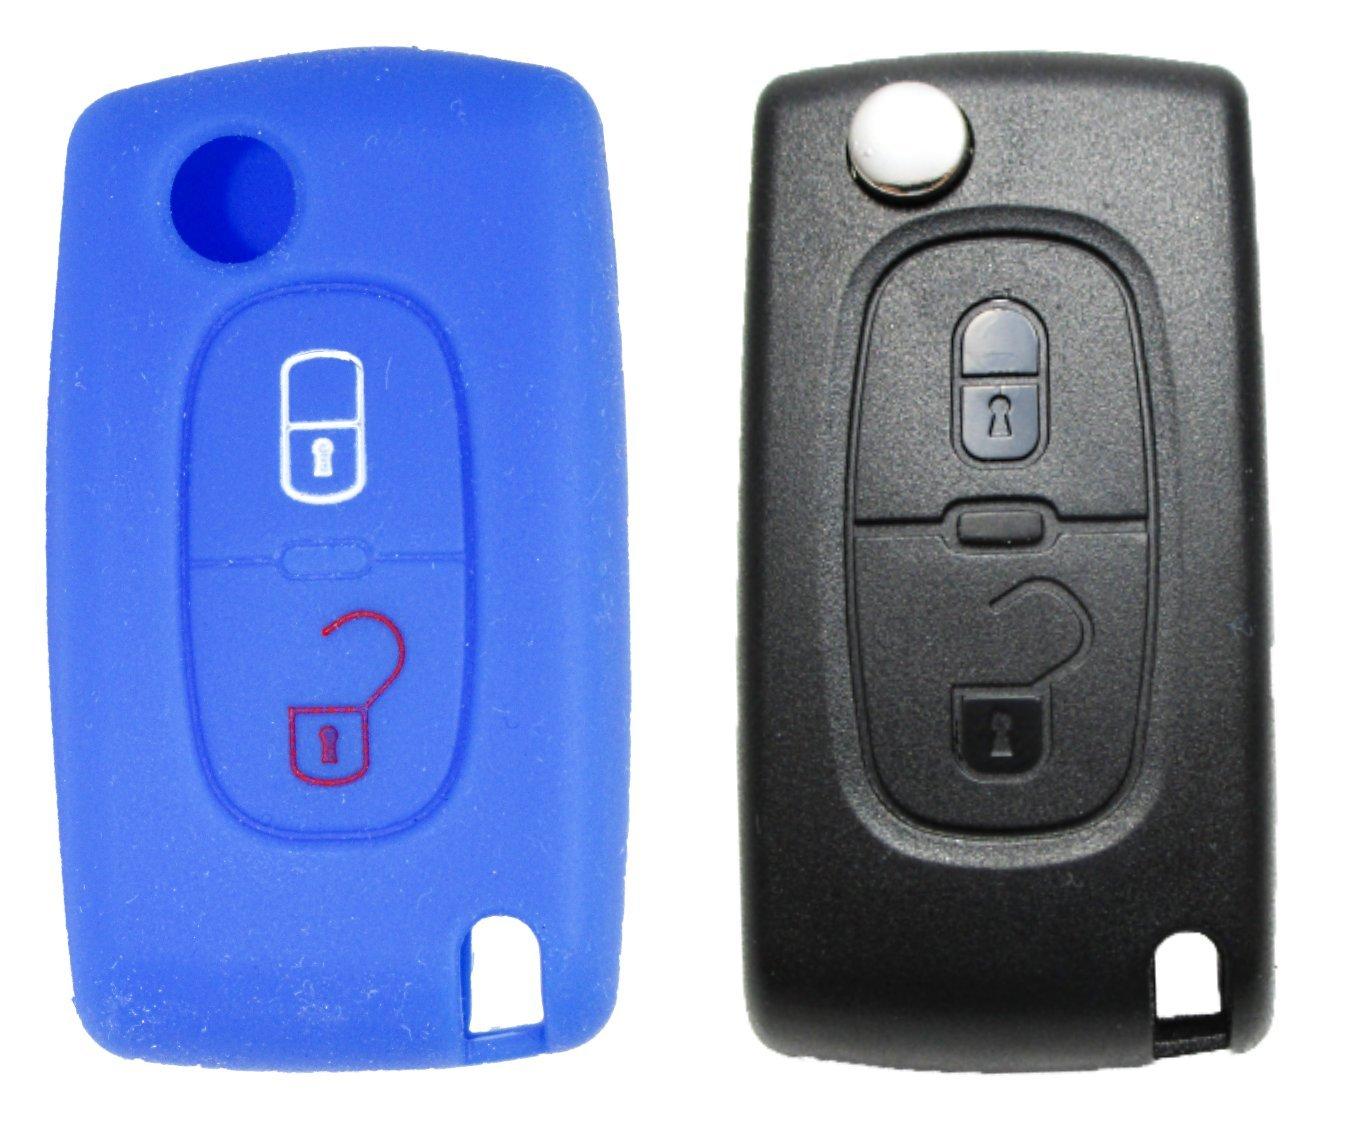 1x Grü ne Autoschlü sselhü lle - Peugeot / Citroen - 2 Tasten - Silikonhü lle - Fernbedienung - Schlü sselhü lle - Key Cover - Schutzü berzug - Klappschlü ssel - Gehä use - Tasche - Silikoncover Gradert-Elektron